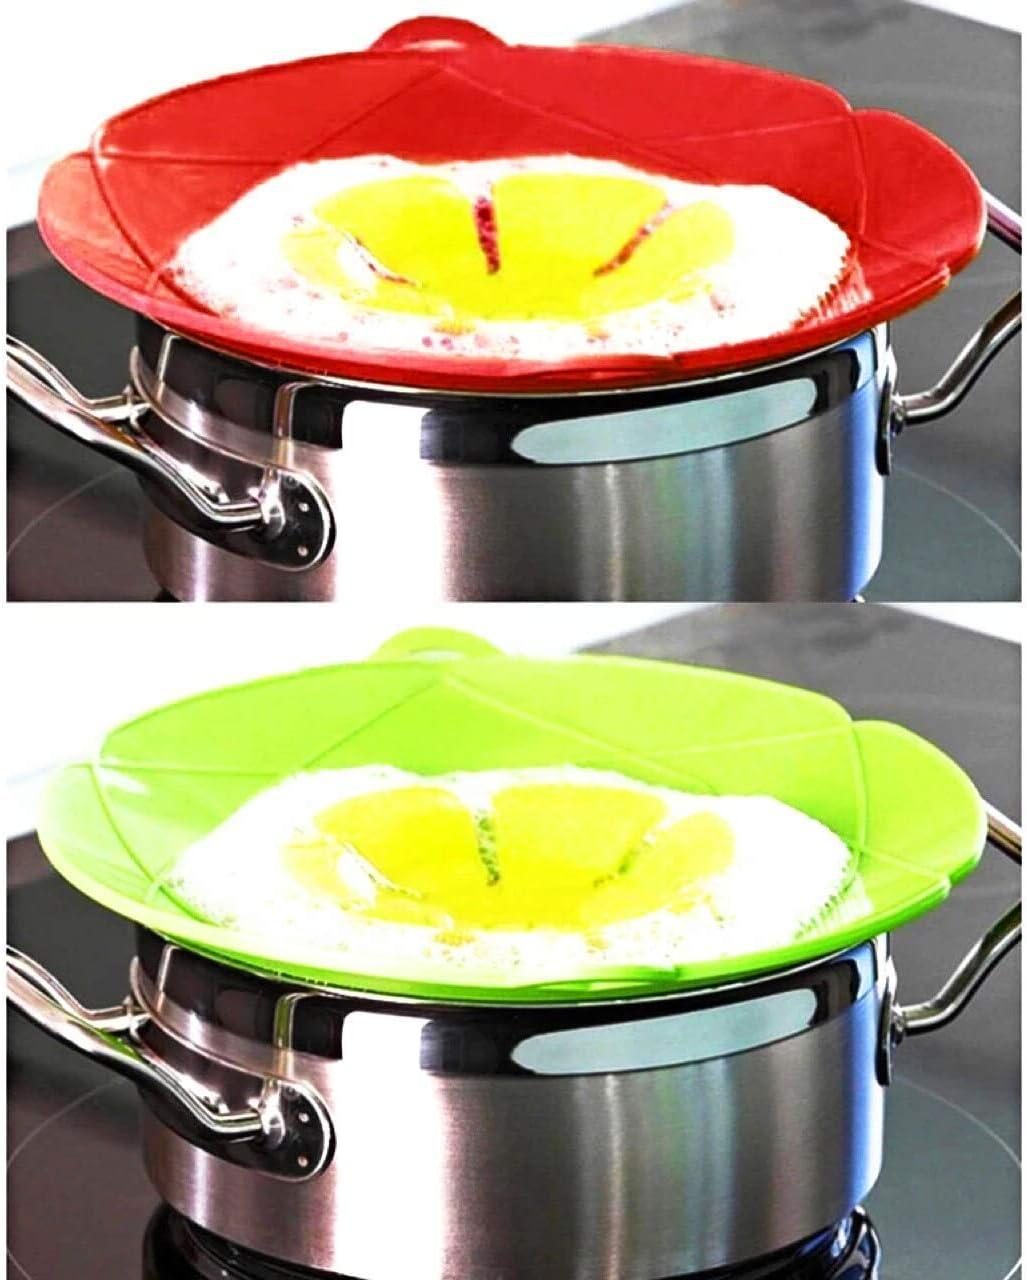 Silicone Boil Over Spill Garde Grattons vapeur Pot Pan Couvercle Couvercle empêche mess